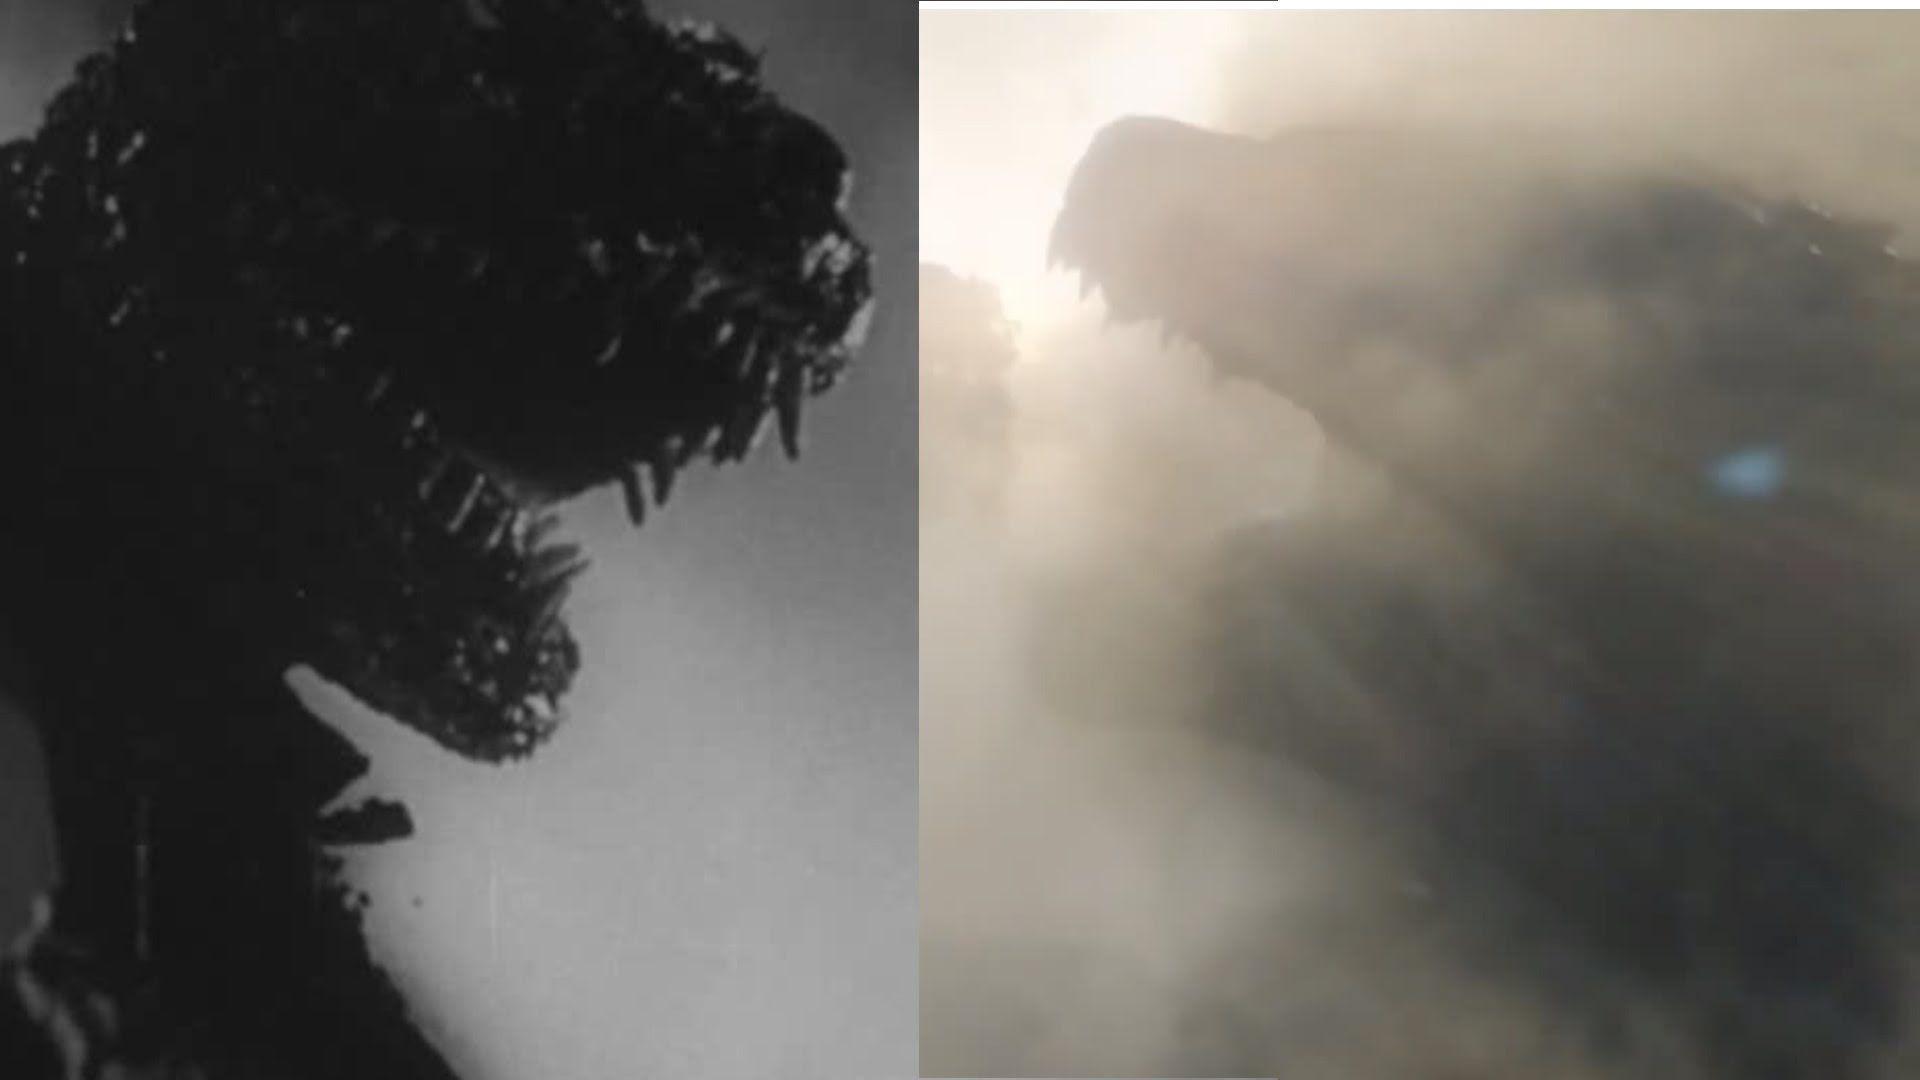 Godzilla 2014 trailer vs 1954 gojira footage